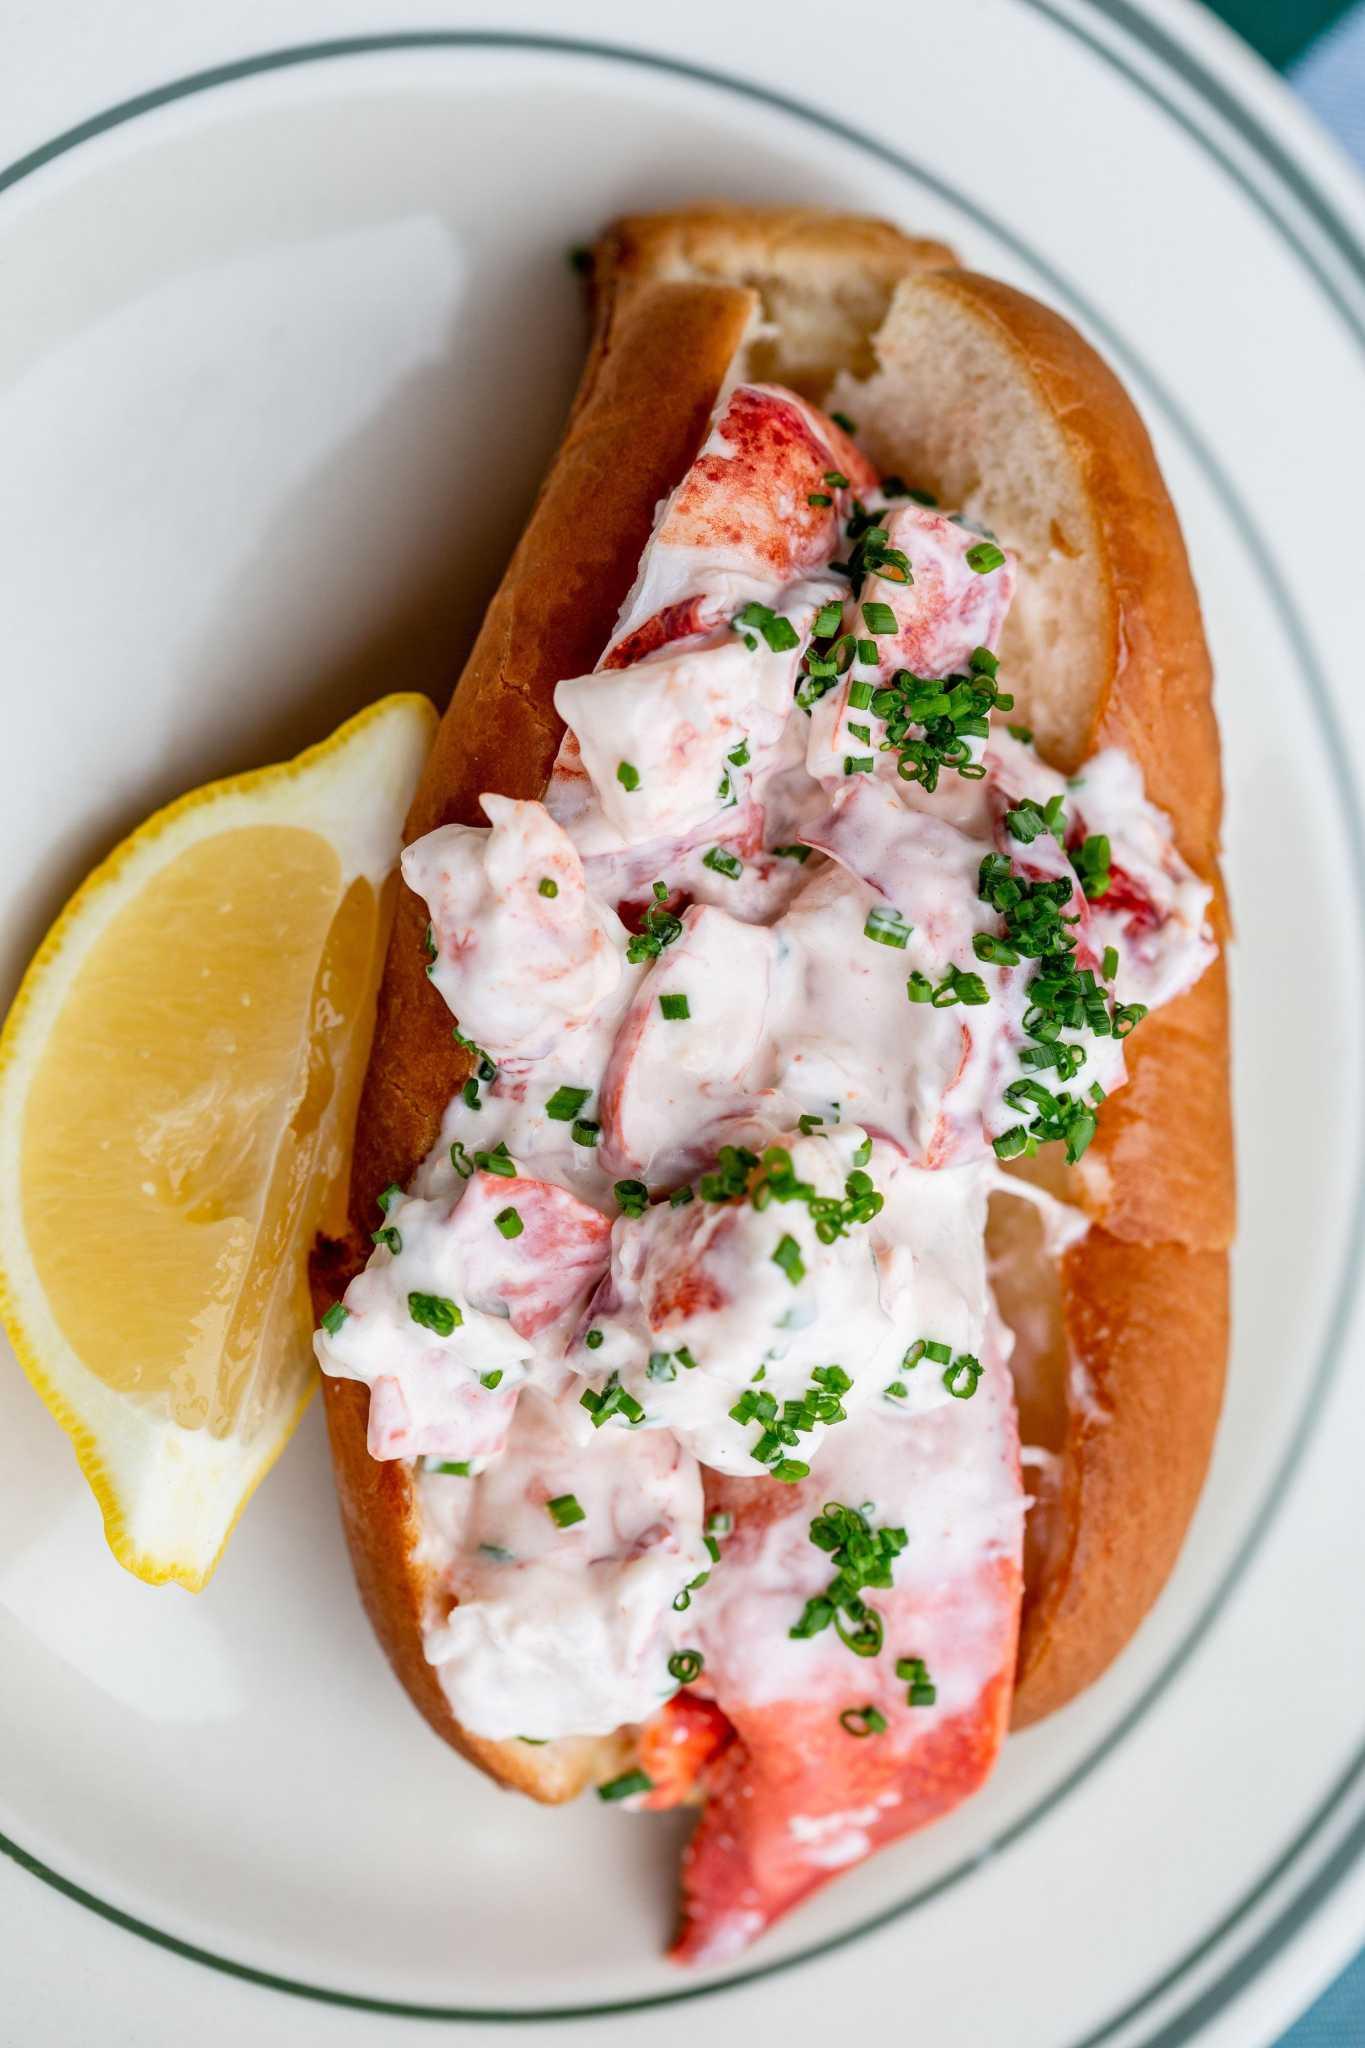 Lobster rolls are summer's most indulgent sandwich